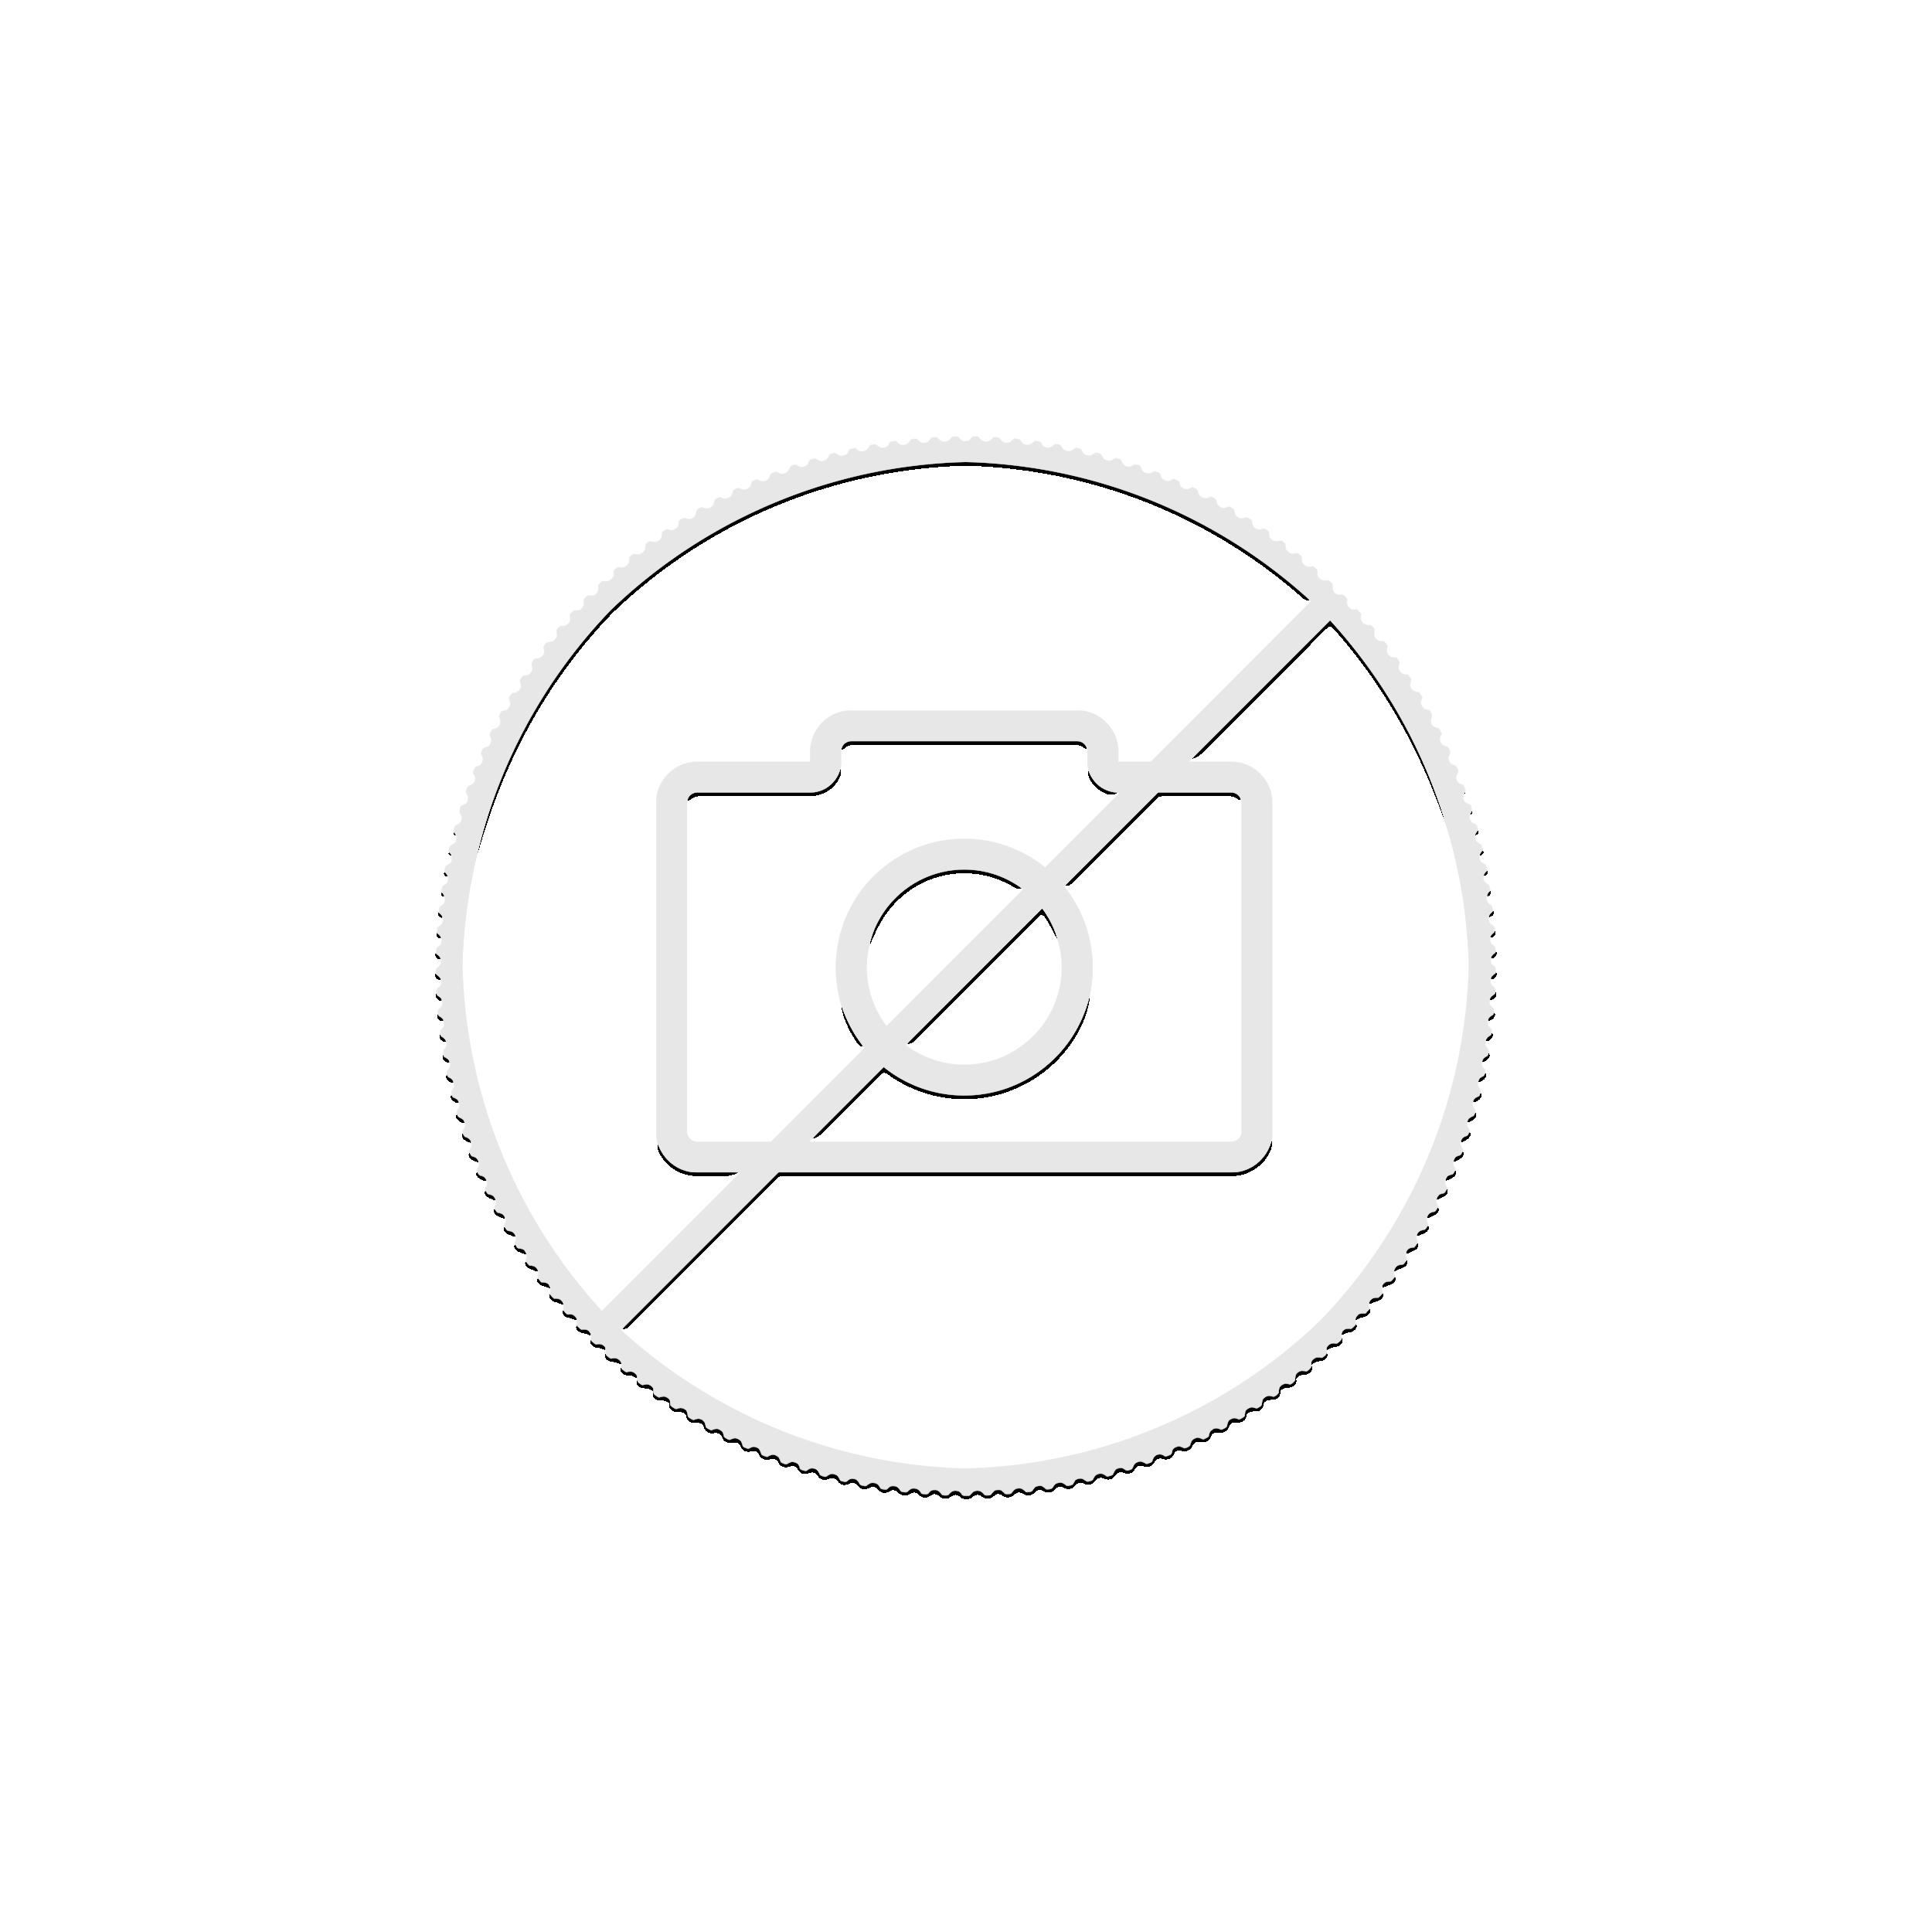 1/2 Troy ounce silver coin Mexican Libertad 2019